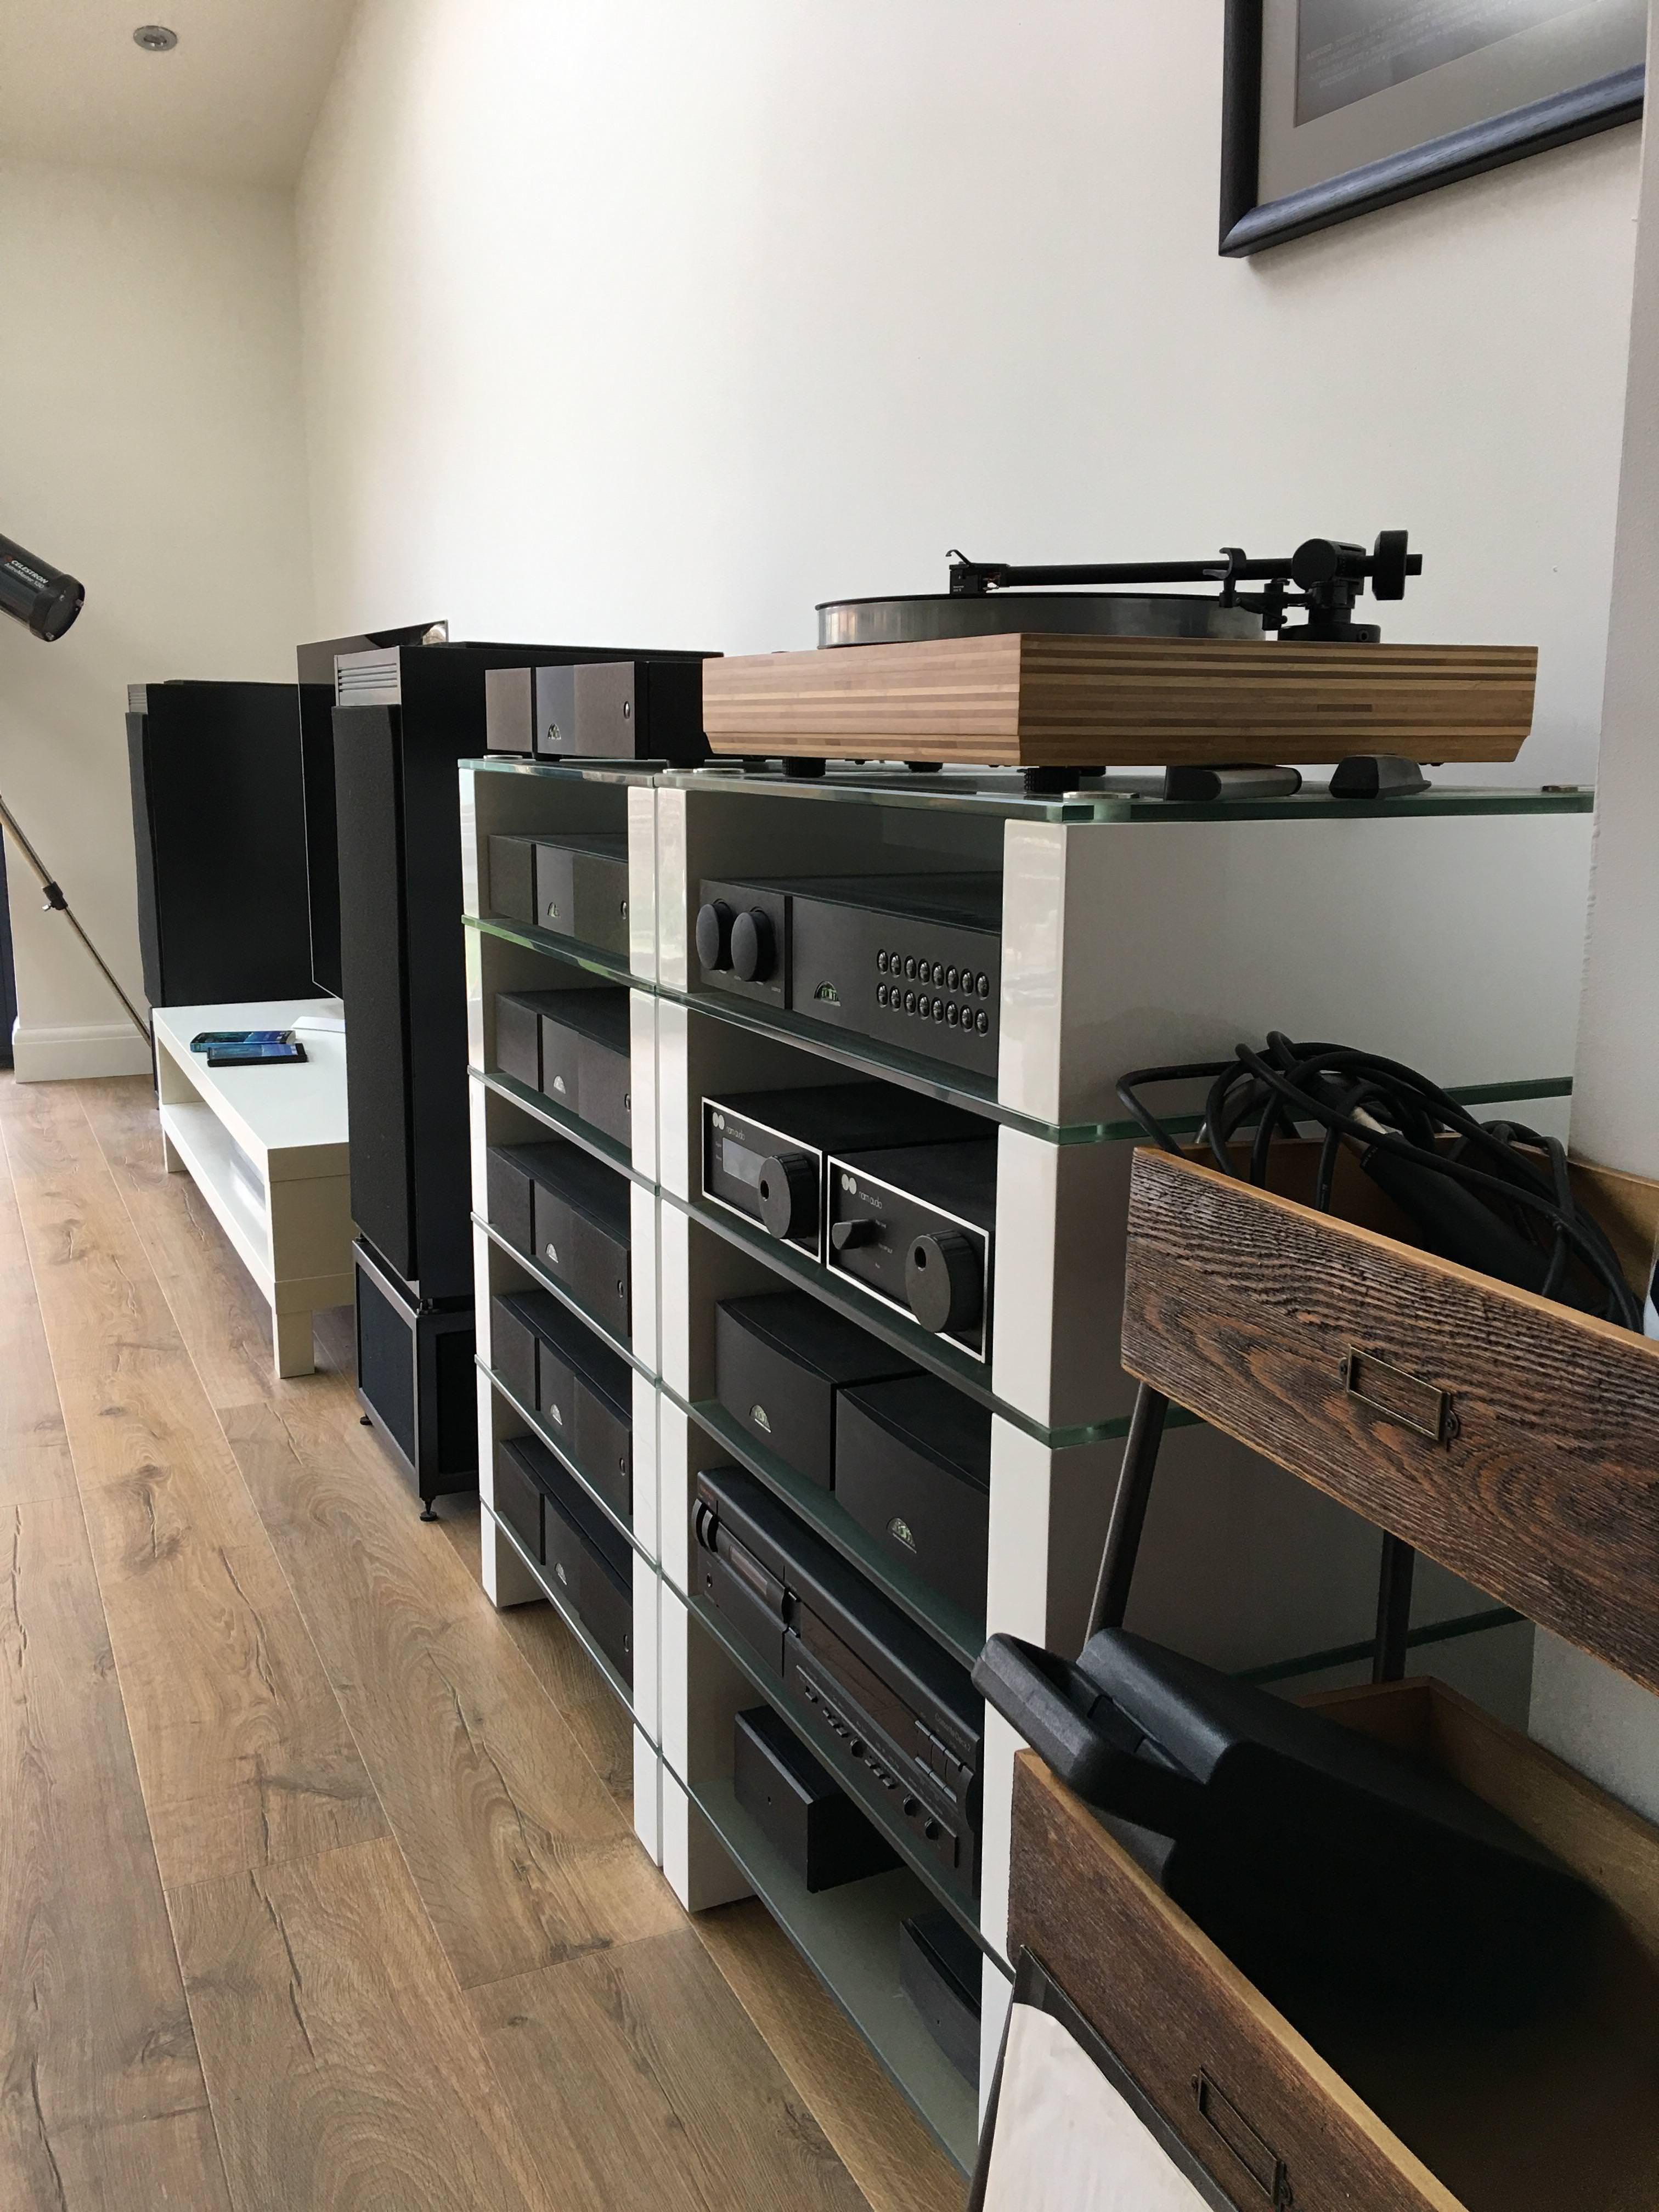 System Pics 2018 | Naim Audio Forums | Hifi | Audio rack, Audio room